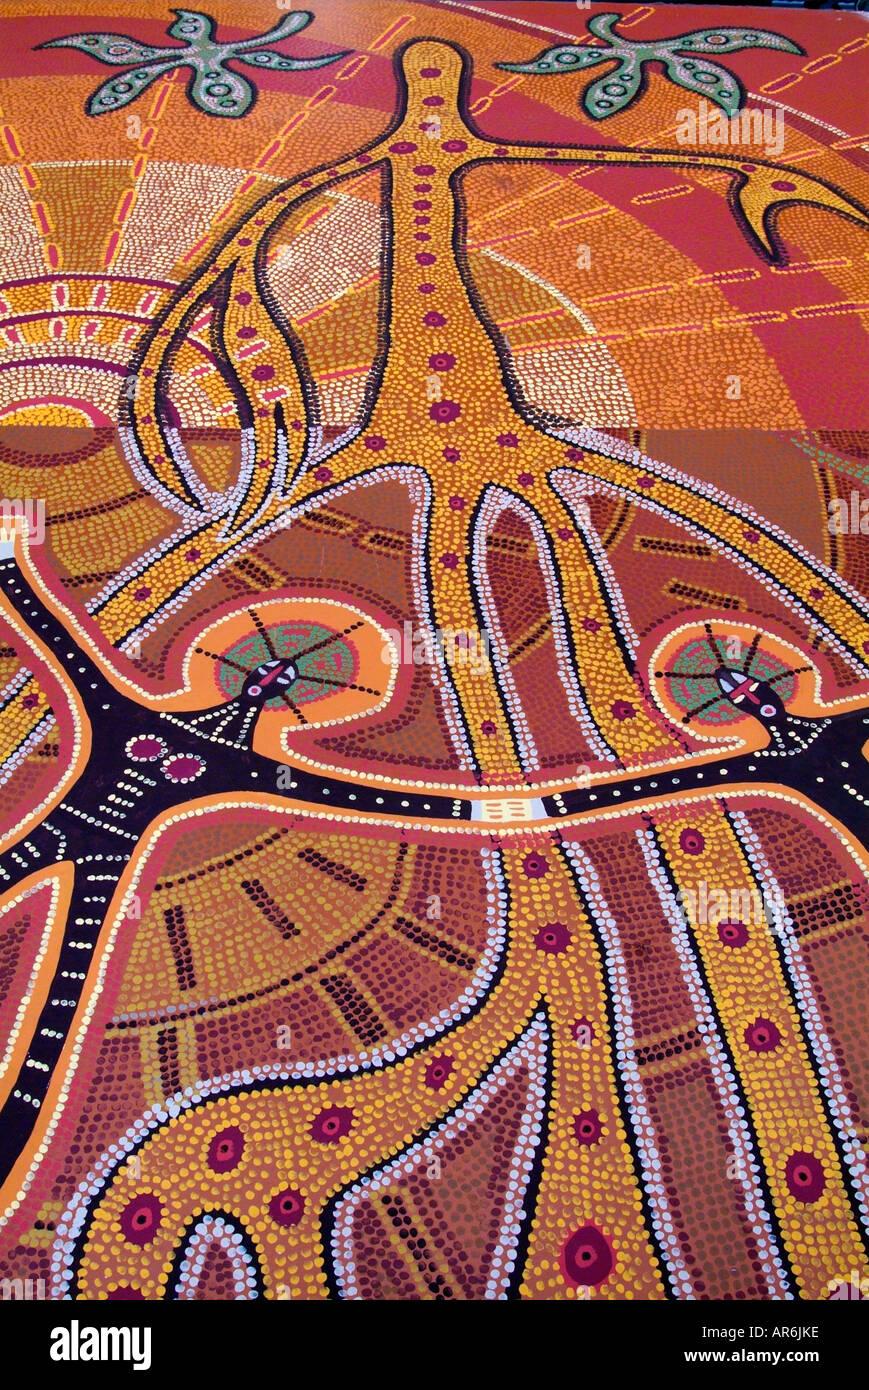 Australia Aboriginal Art Dream Time Earth Dot Paint Culture Stock